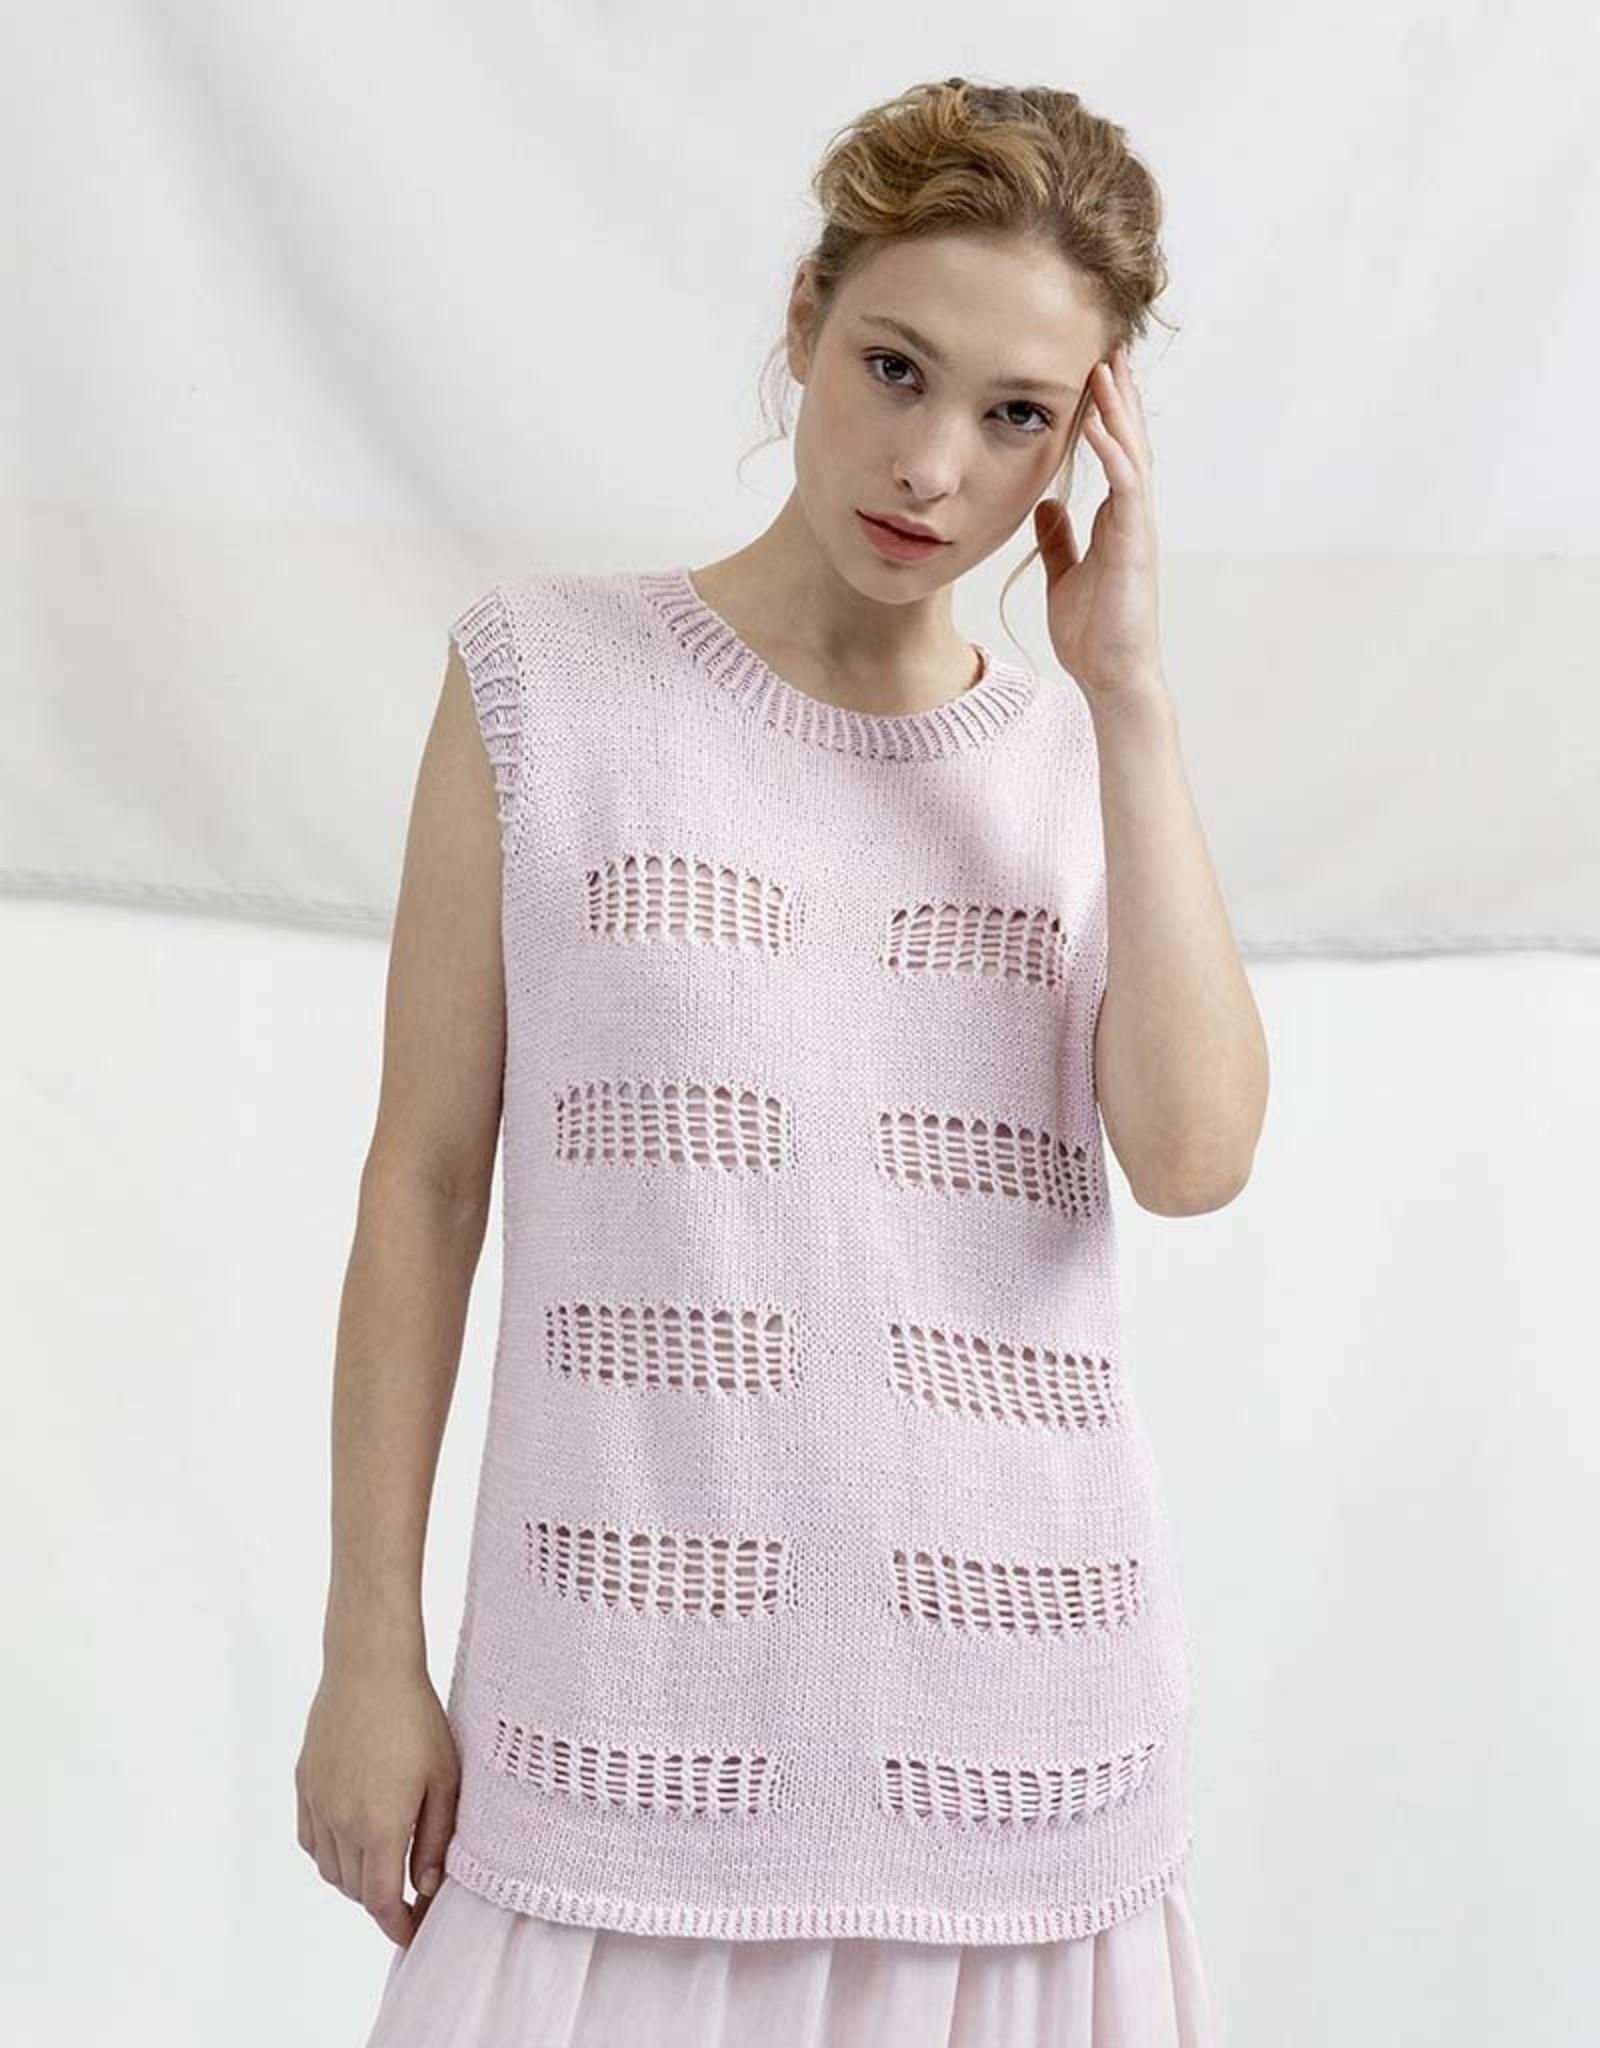 Angels-Knit by FDF Breipakket Top Divina Large - 09